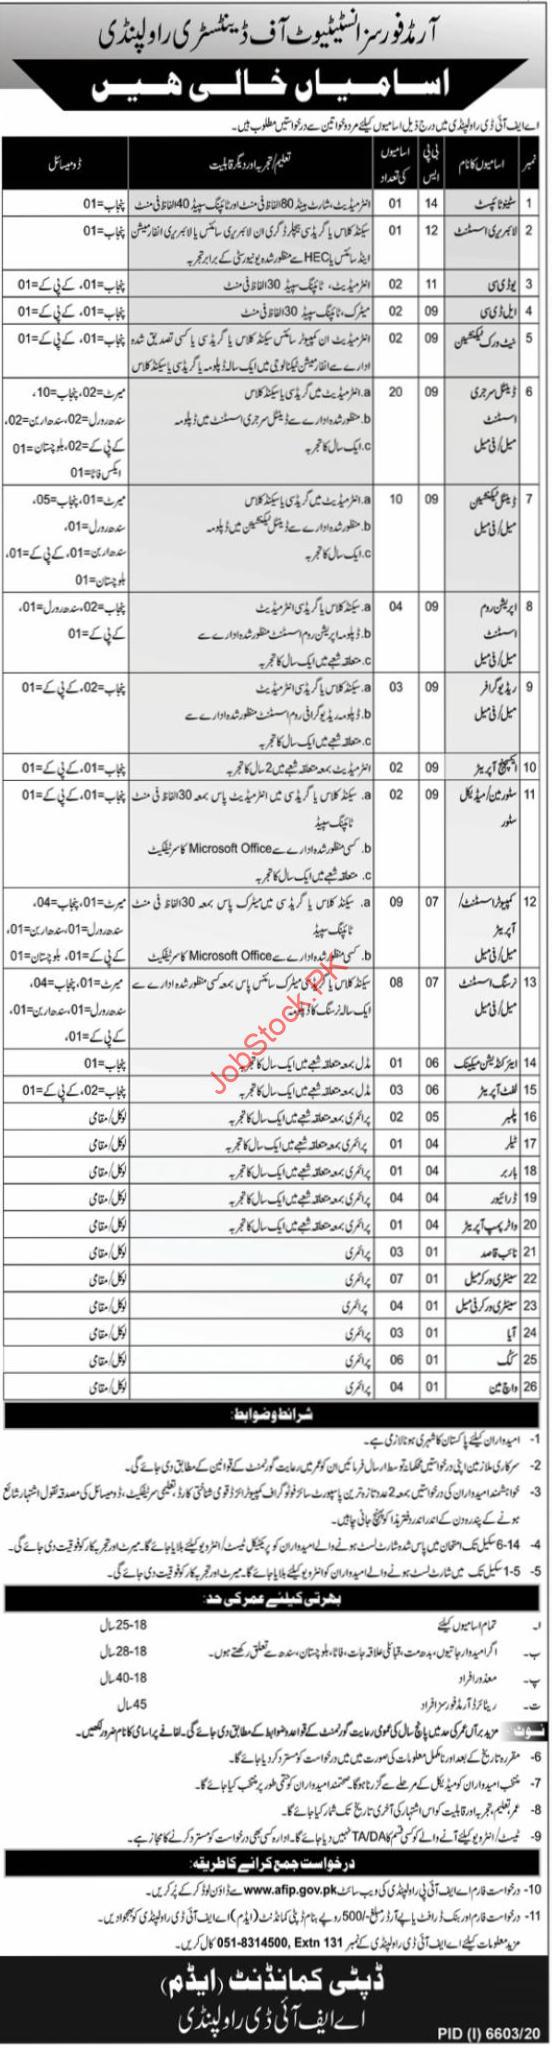 Afip Afid Rawalpindi Jobs 2021 Newspaper Advertisement Afip.org.pk Jobs